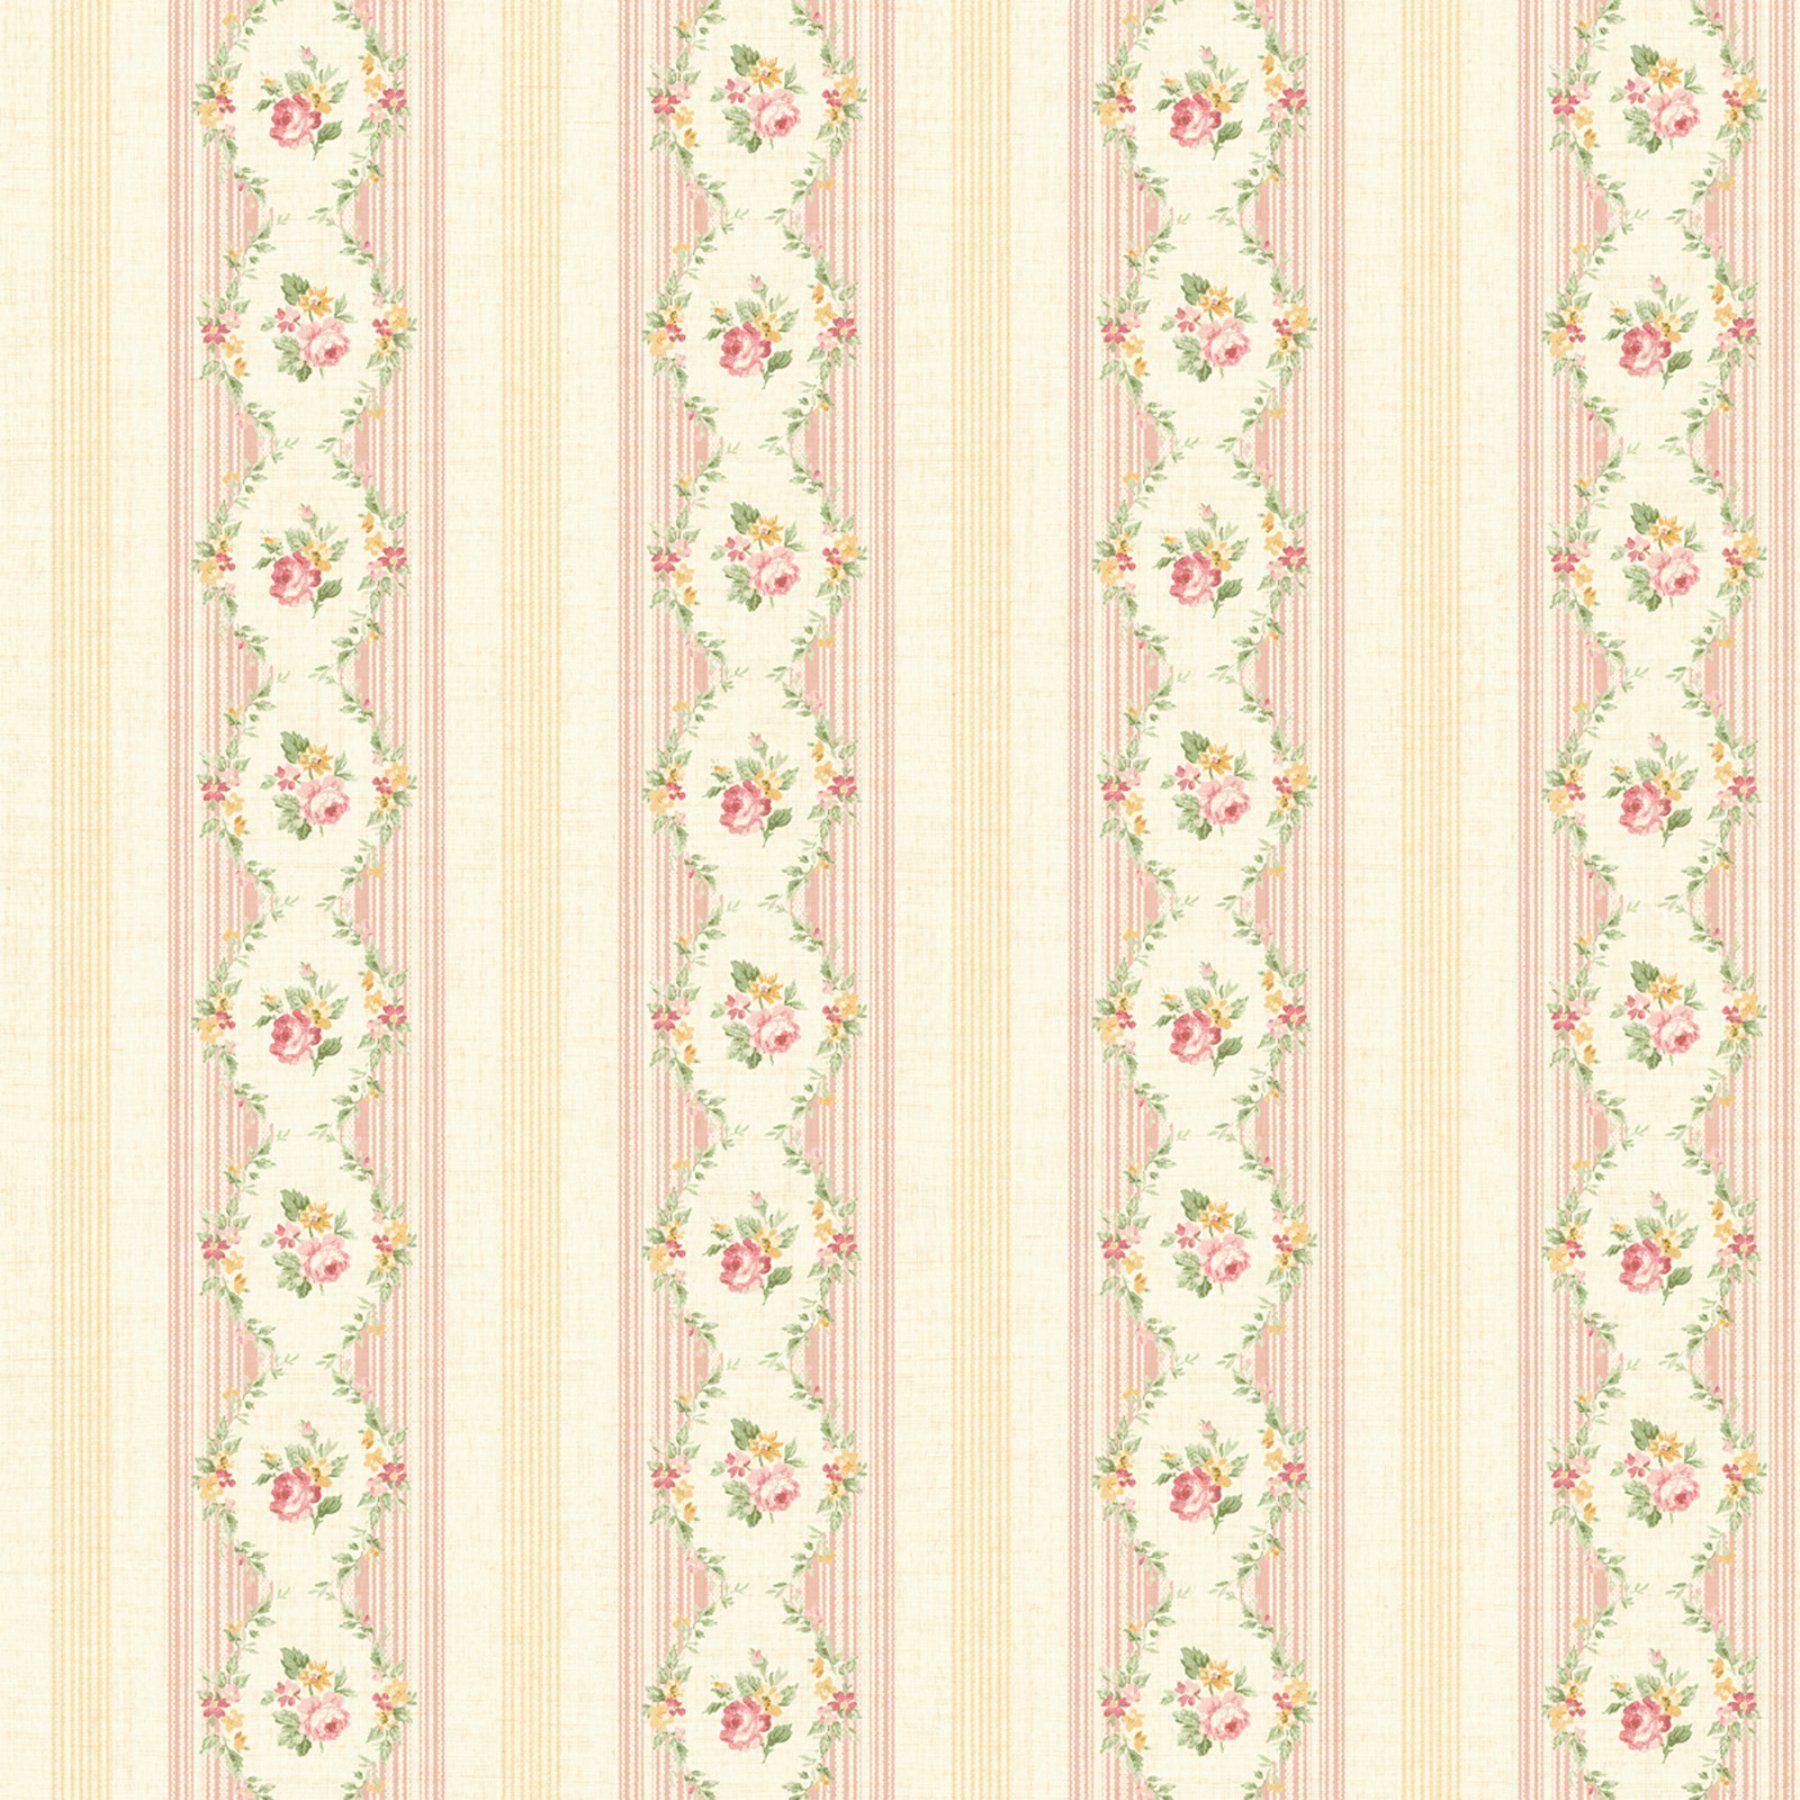 Fairwinds Studios Mini Floral Stripe Wallpaper Striped Wallpaper